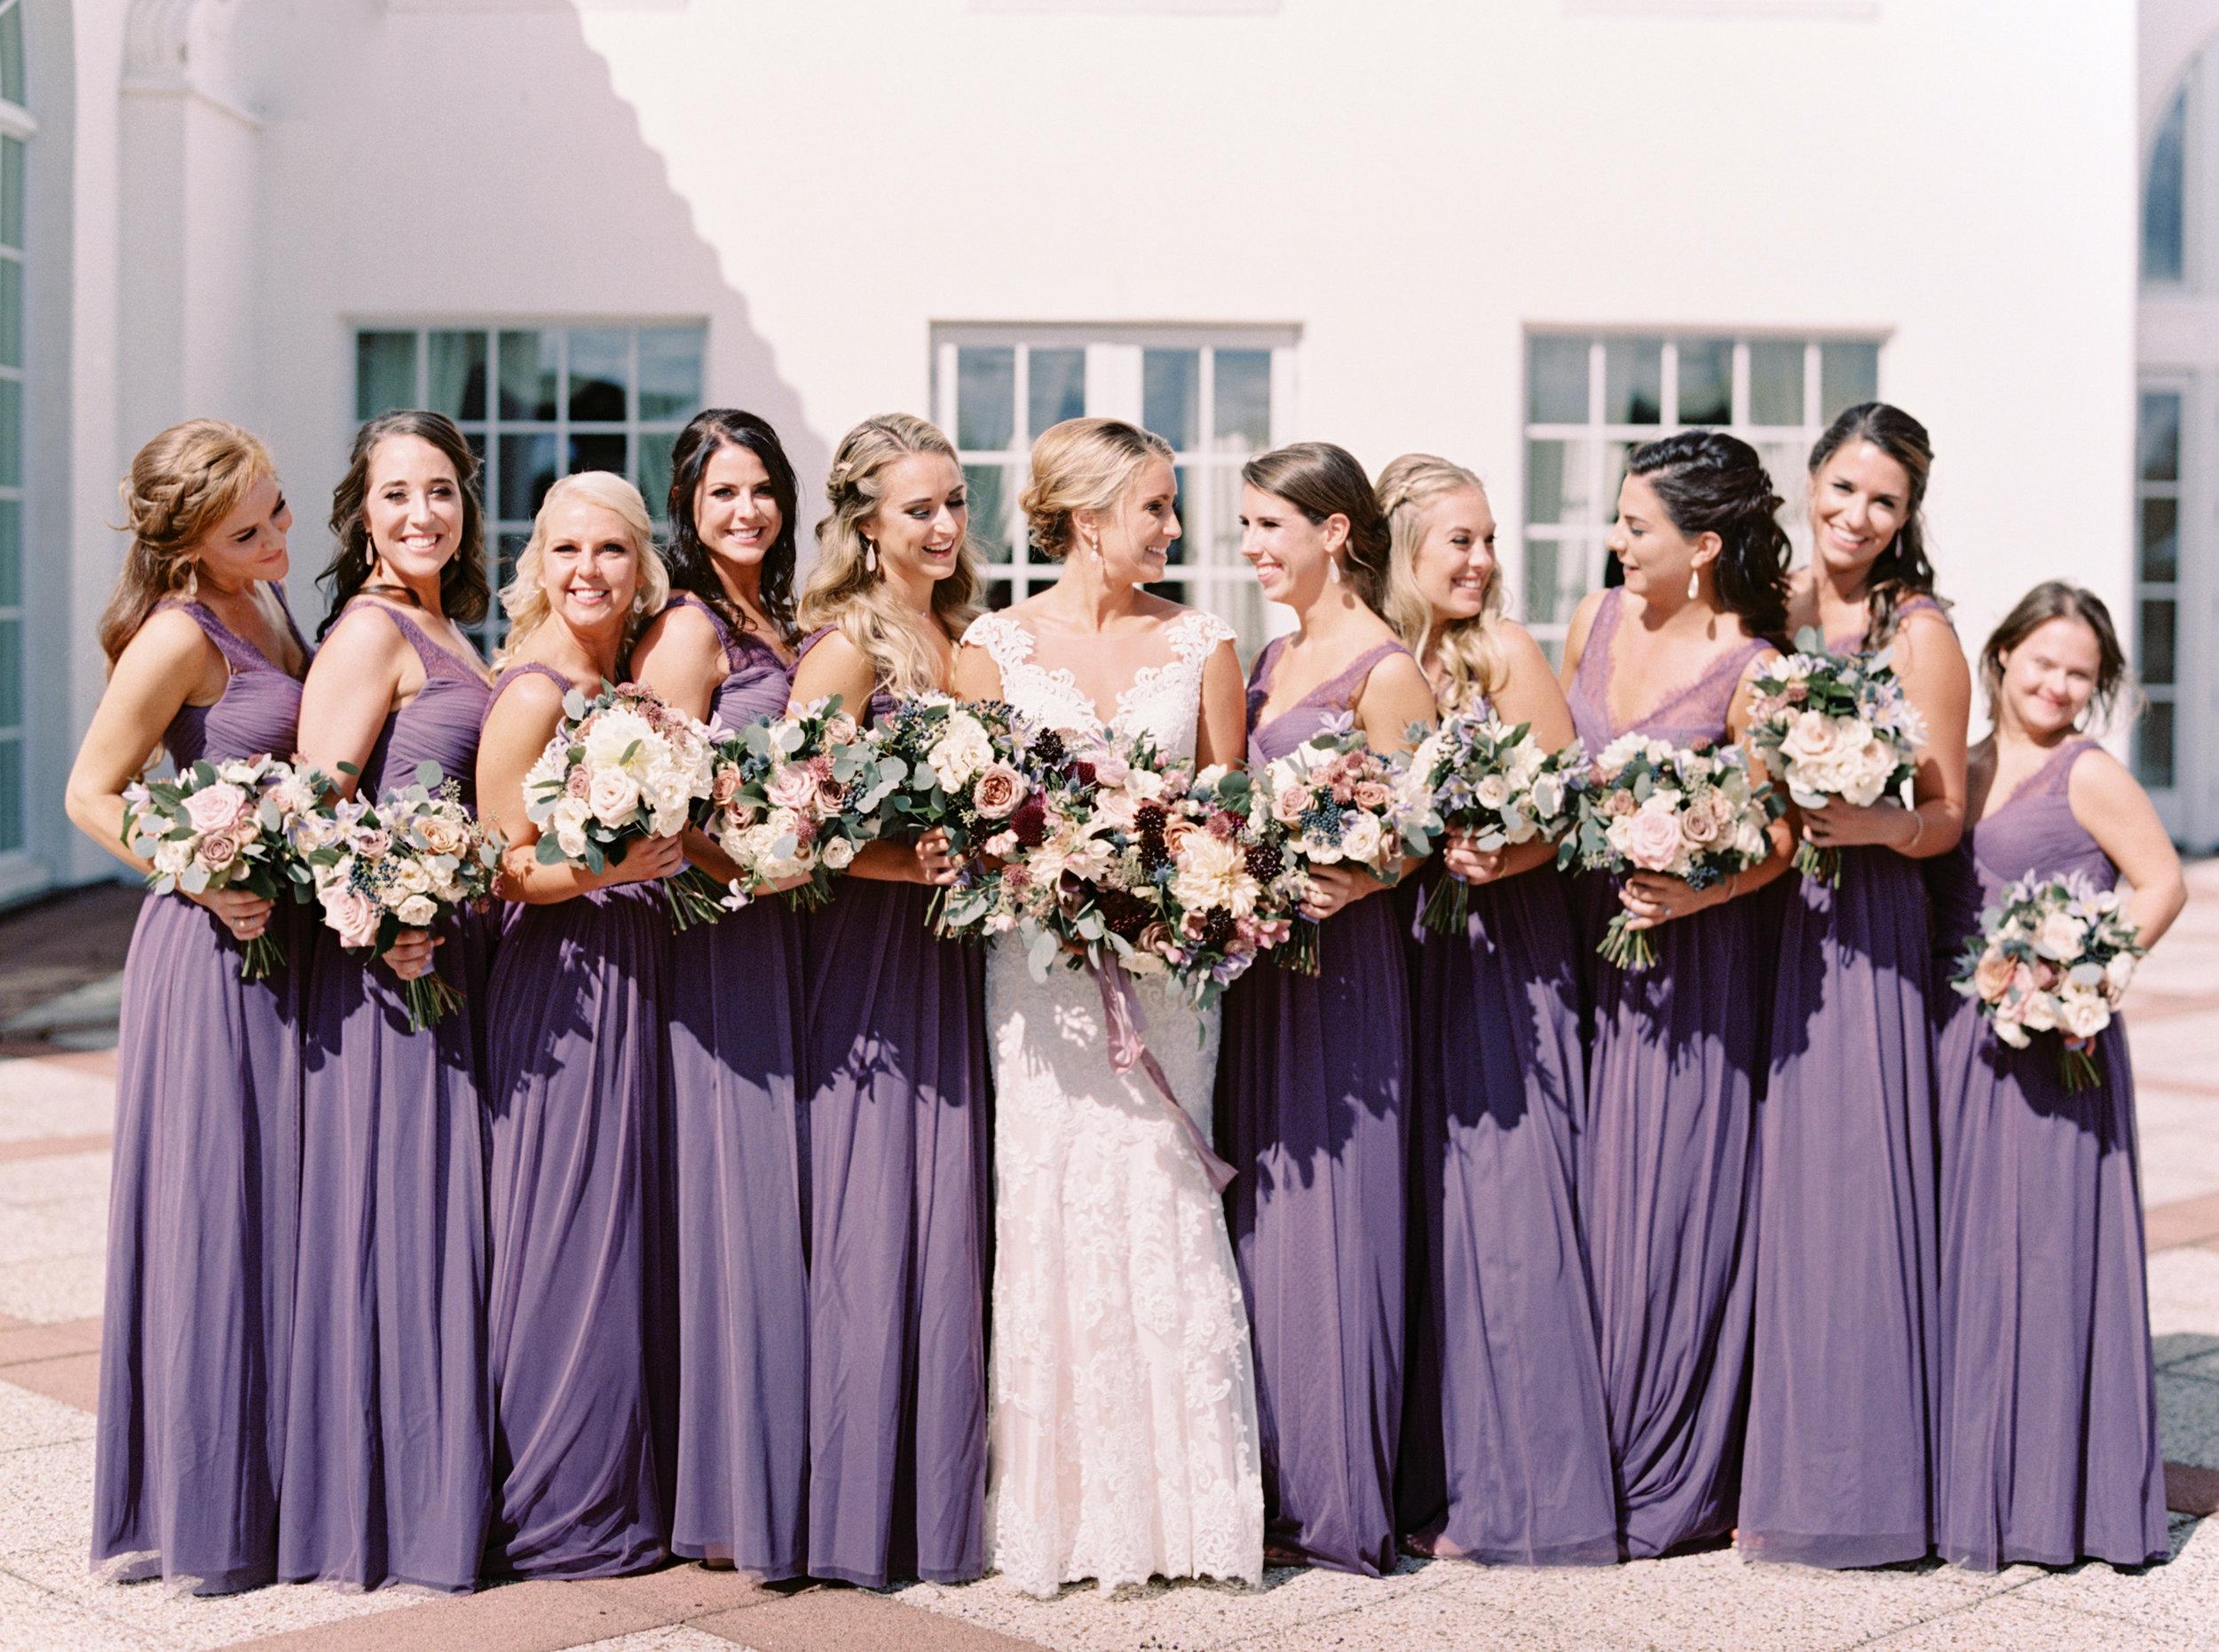 Congressional-Country-Club-wedding-Bathesda-Maryland-wedding-photographer-Richmond-natalie-jayne-photography-image-01.jpg